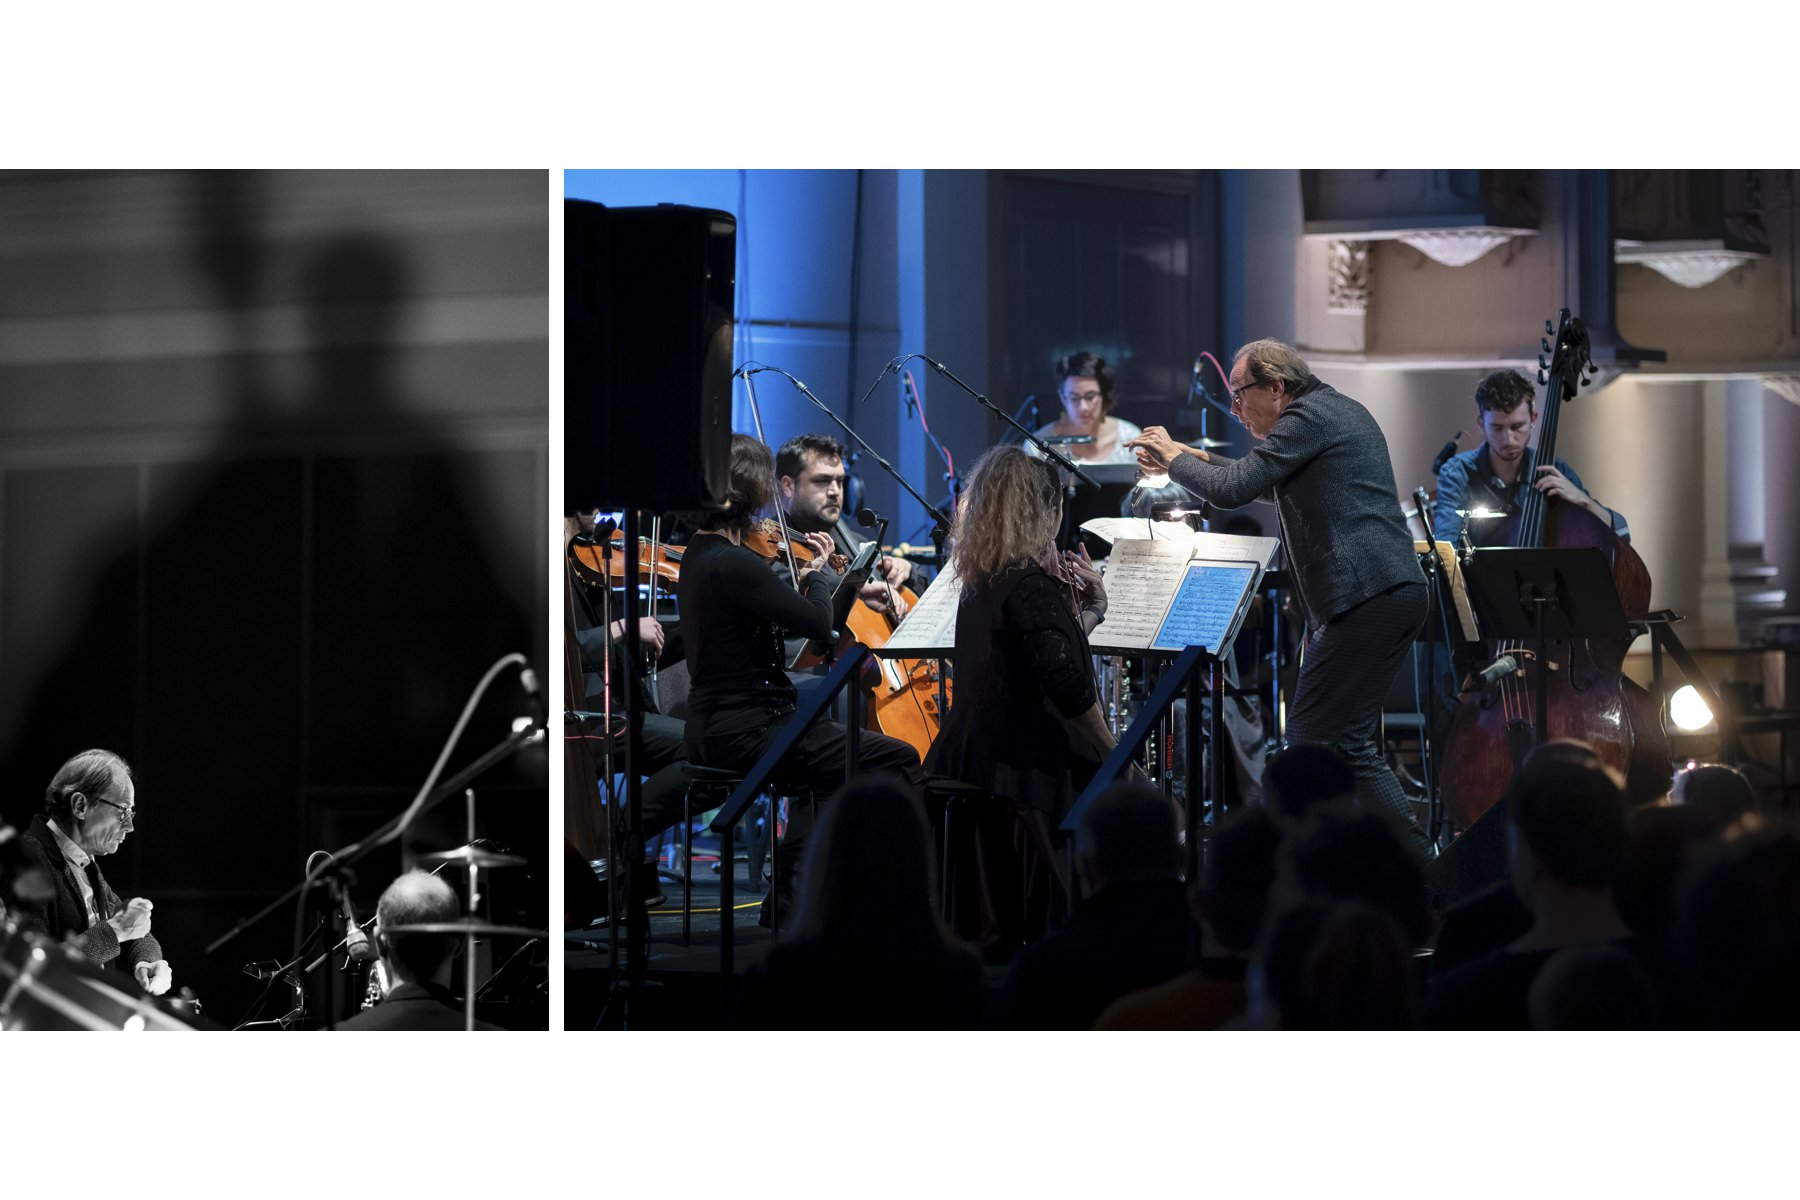 Ensemble Offspring - Kontiki Racket, 2019 Photography by Christopher Hayles-0016.jpg